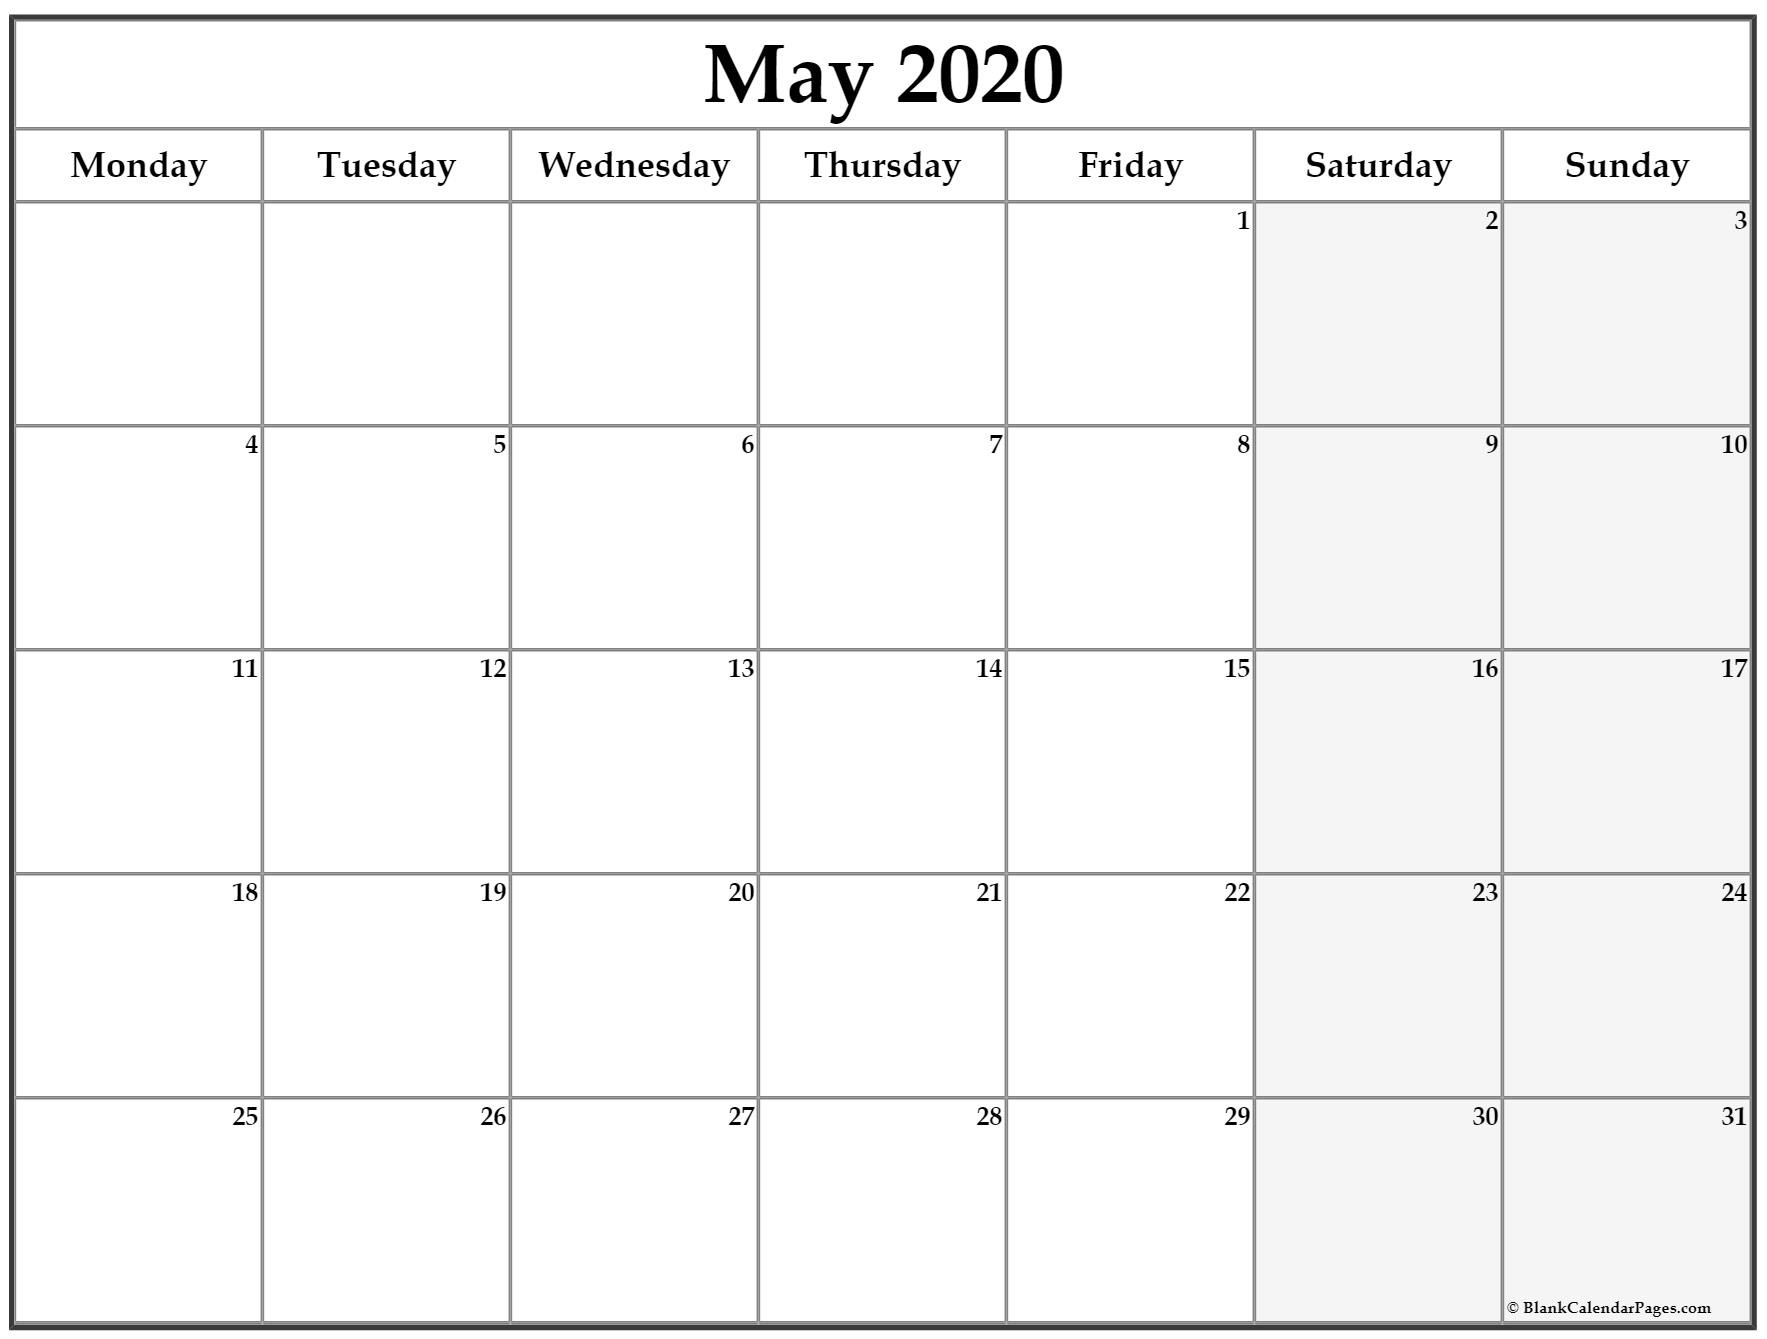 May 2020 Monday Calendar | Monday To Sunday-Monday Friday Blank Calendar